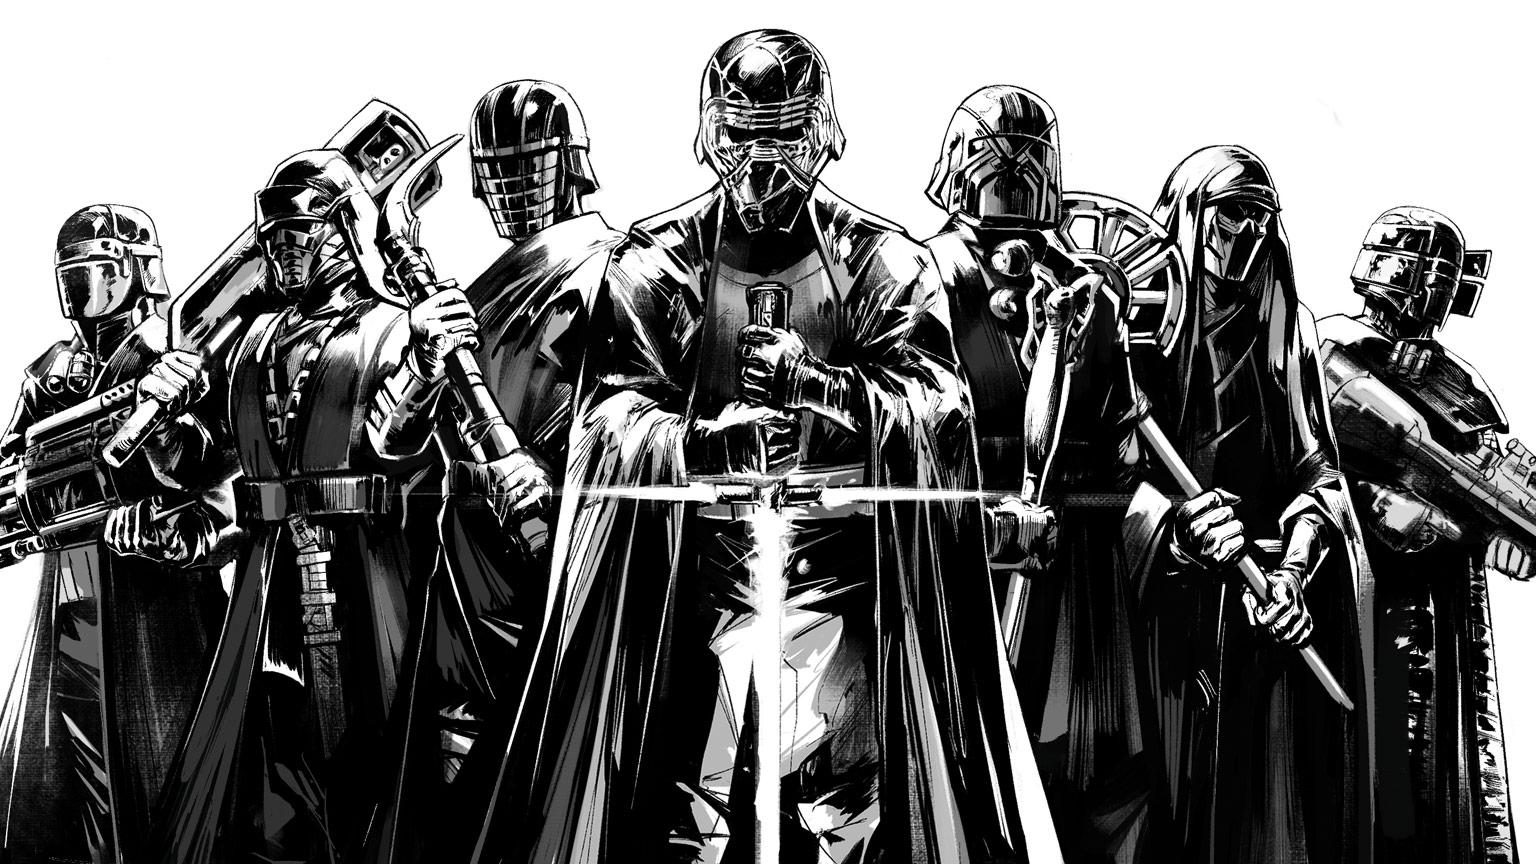 star wars kajlo ren i vitezovi rena naslovnica stripa